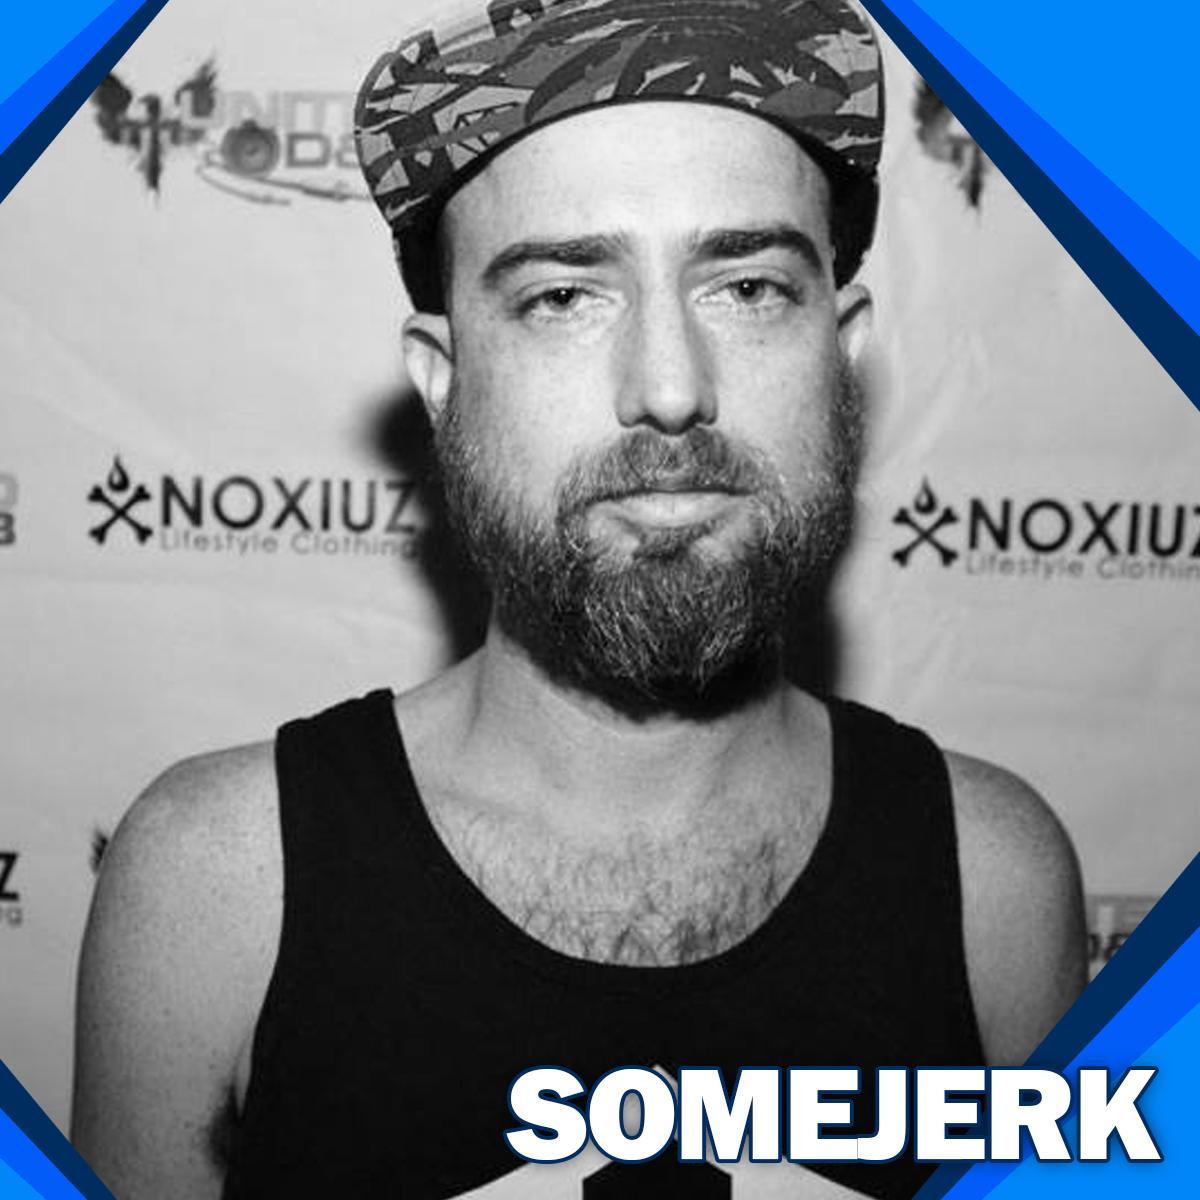 somejerk